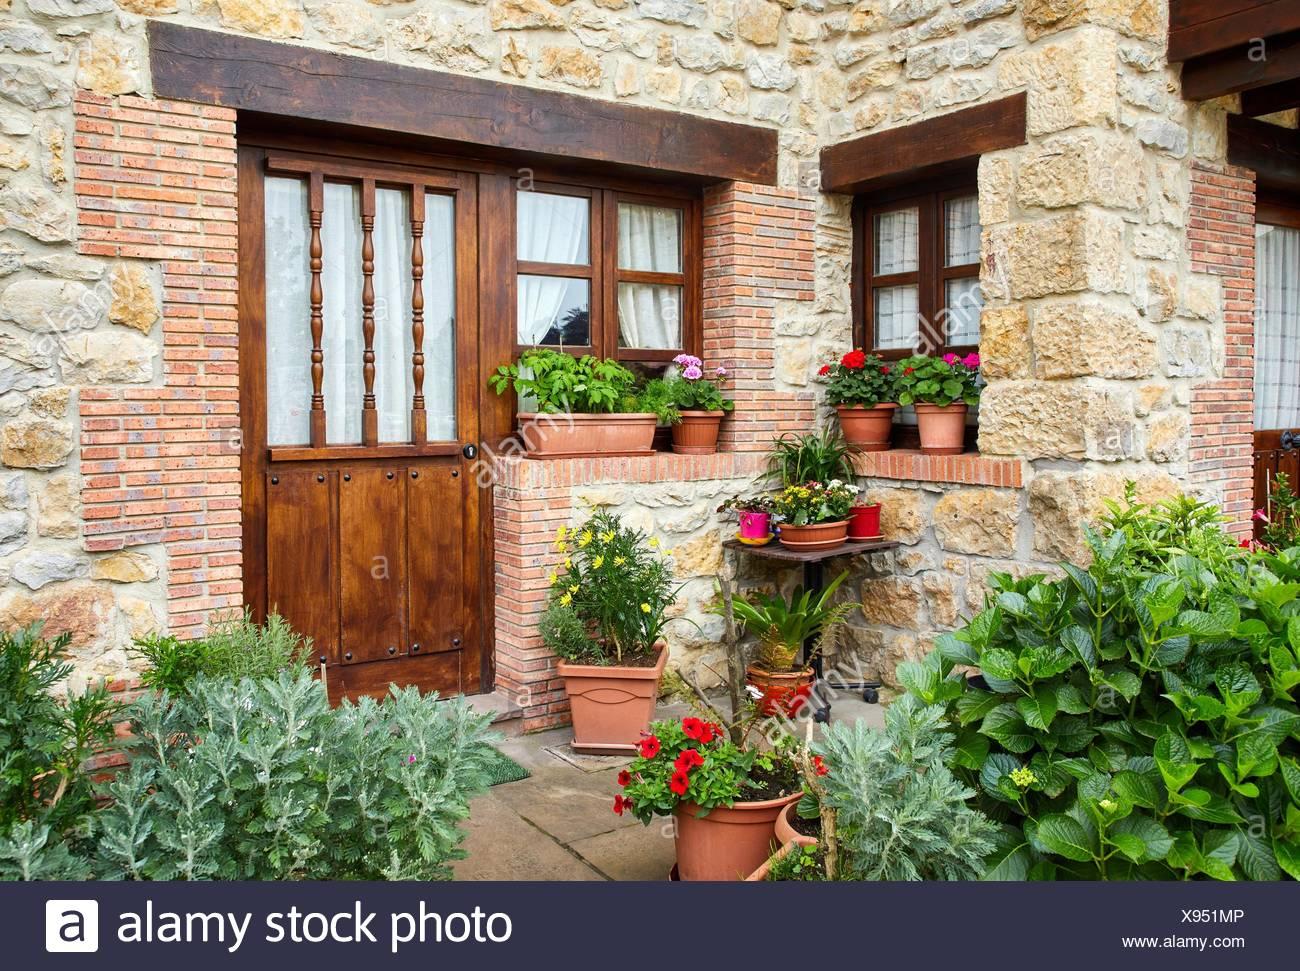 Santillana del Mar, Cantabria, Spain - Stock Image